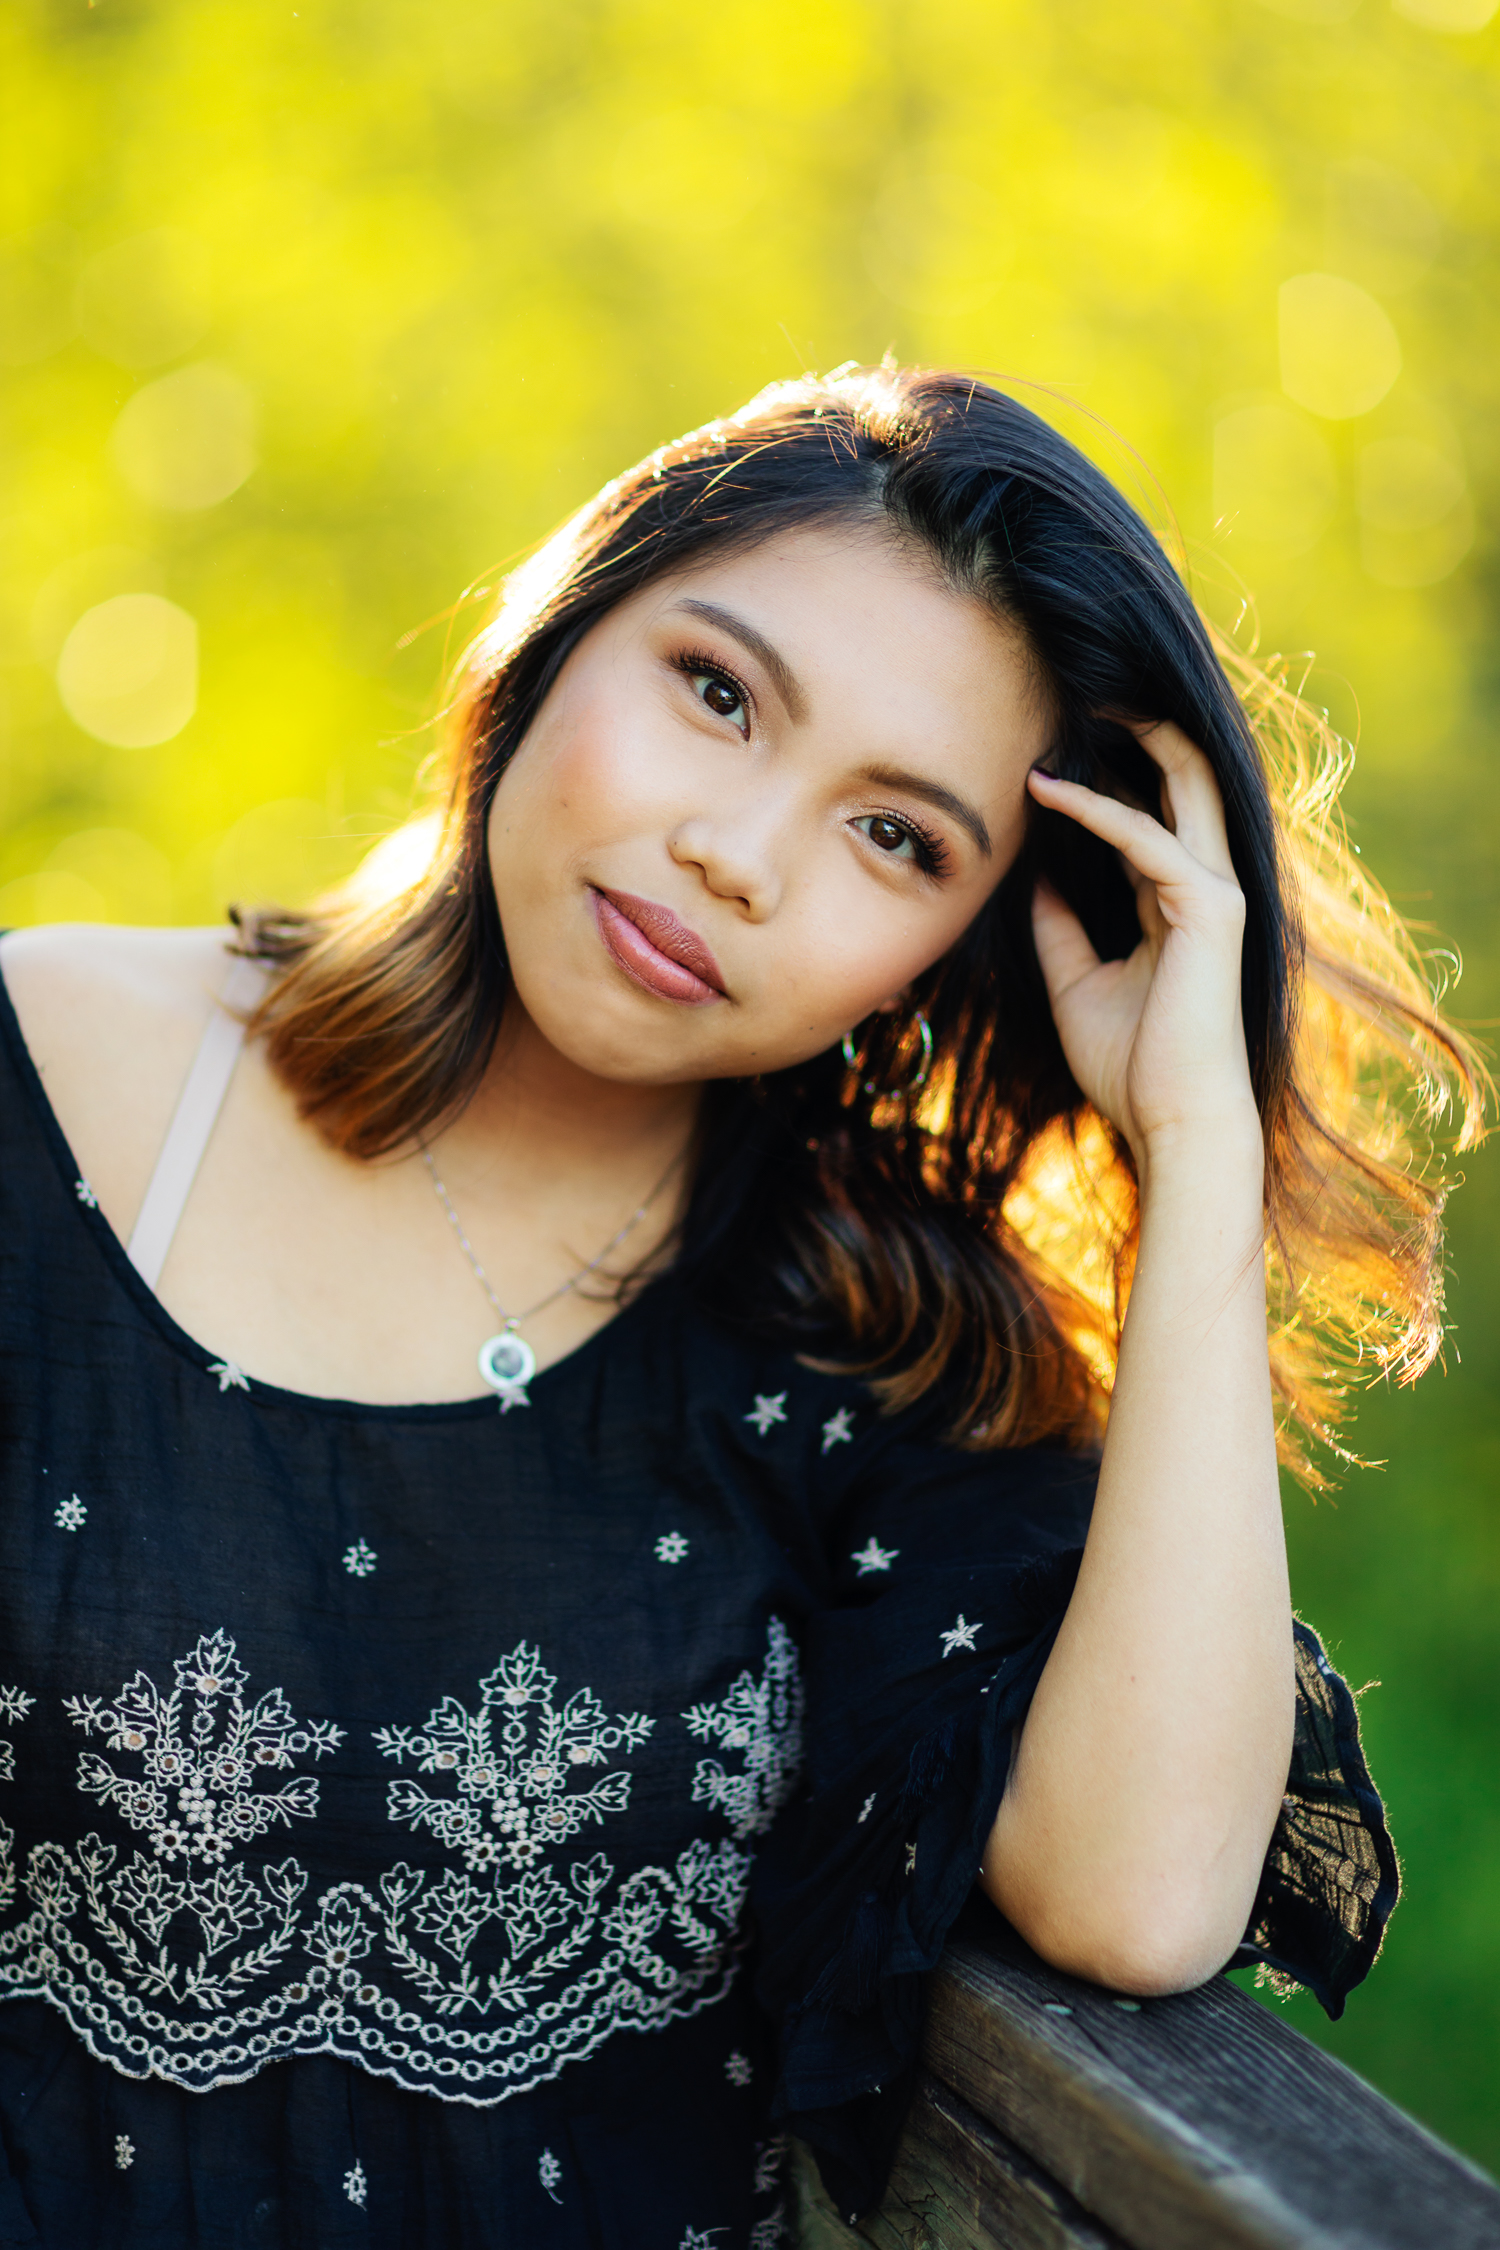 ariellanoellephotography-highschool-senior-portraiture-seattle-area-monroe-duvall-washington-state-redmond-kirkland-bellevue-snohomish-portraiture-graduation-images-1-5.jpg